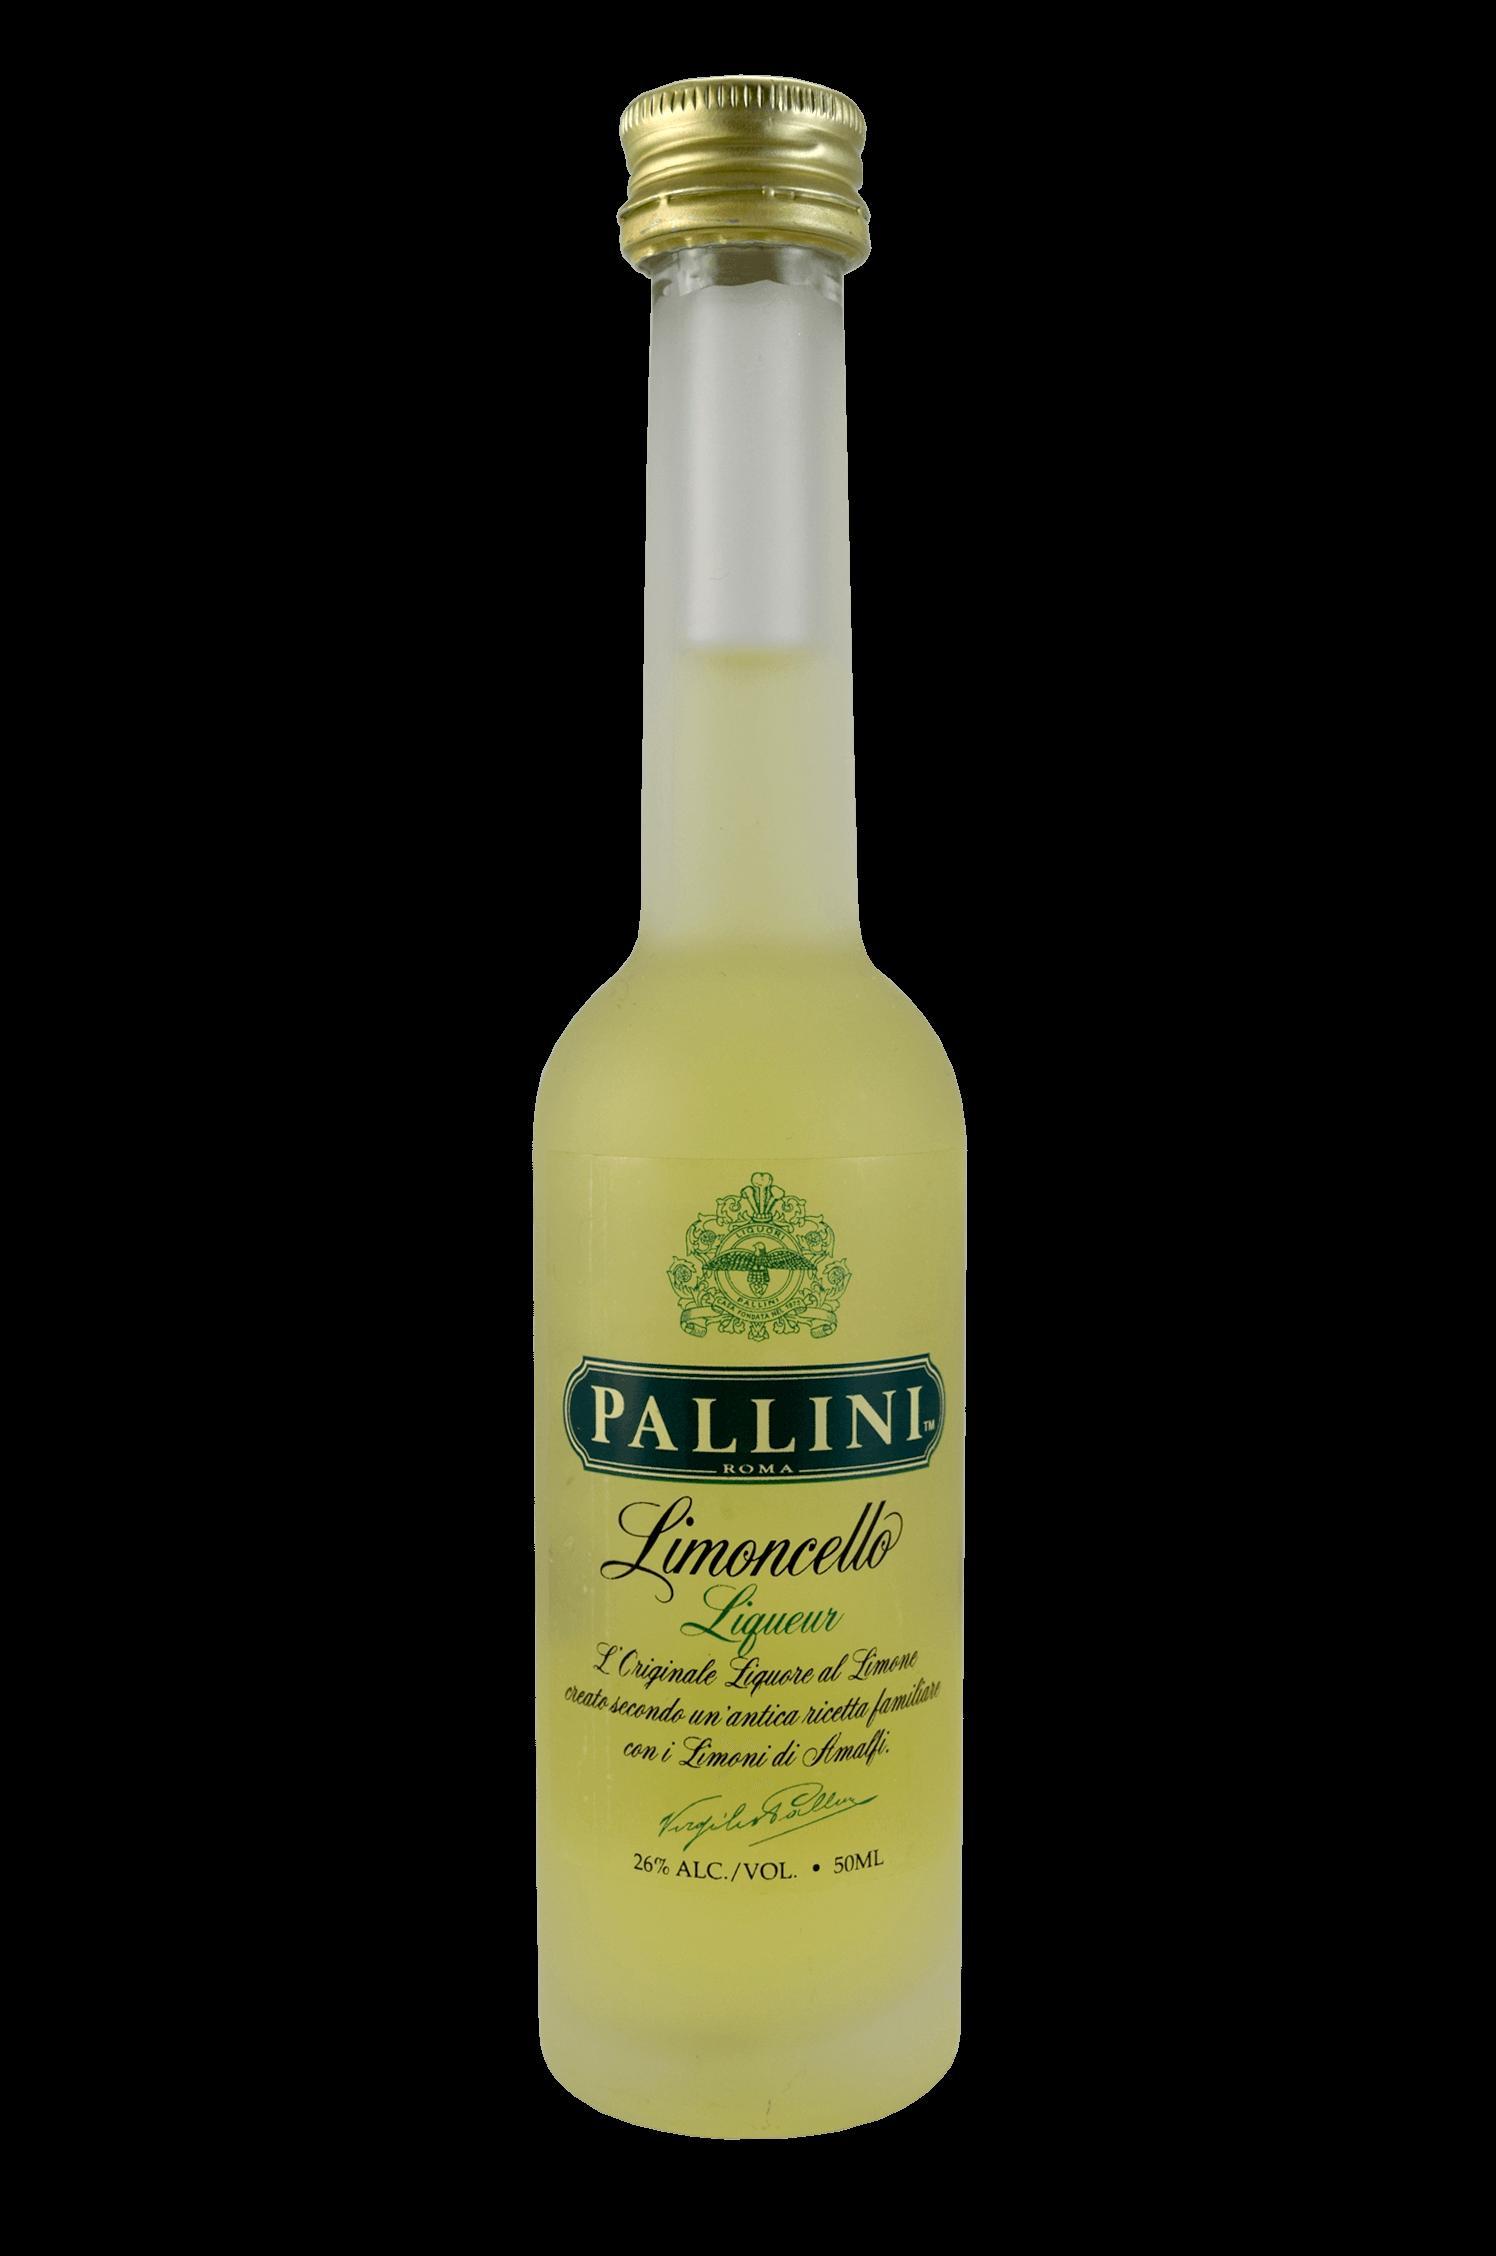 Pallini Limoncello Liquore